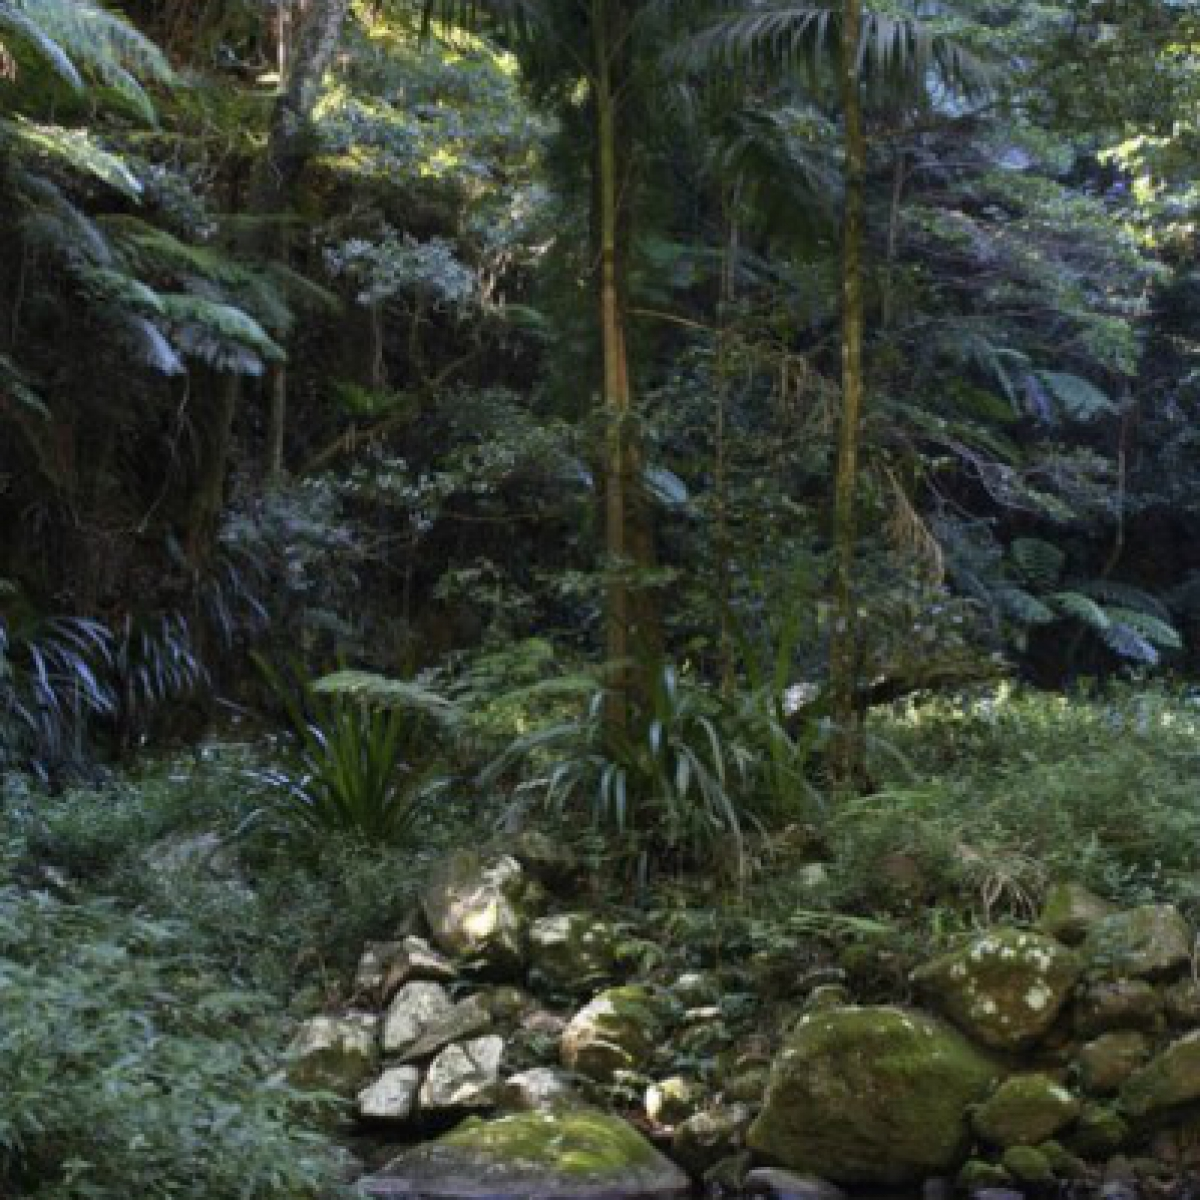 Rock pool on Running Creek - Lamington National Park, Queensland